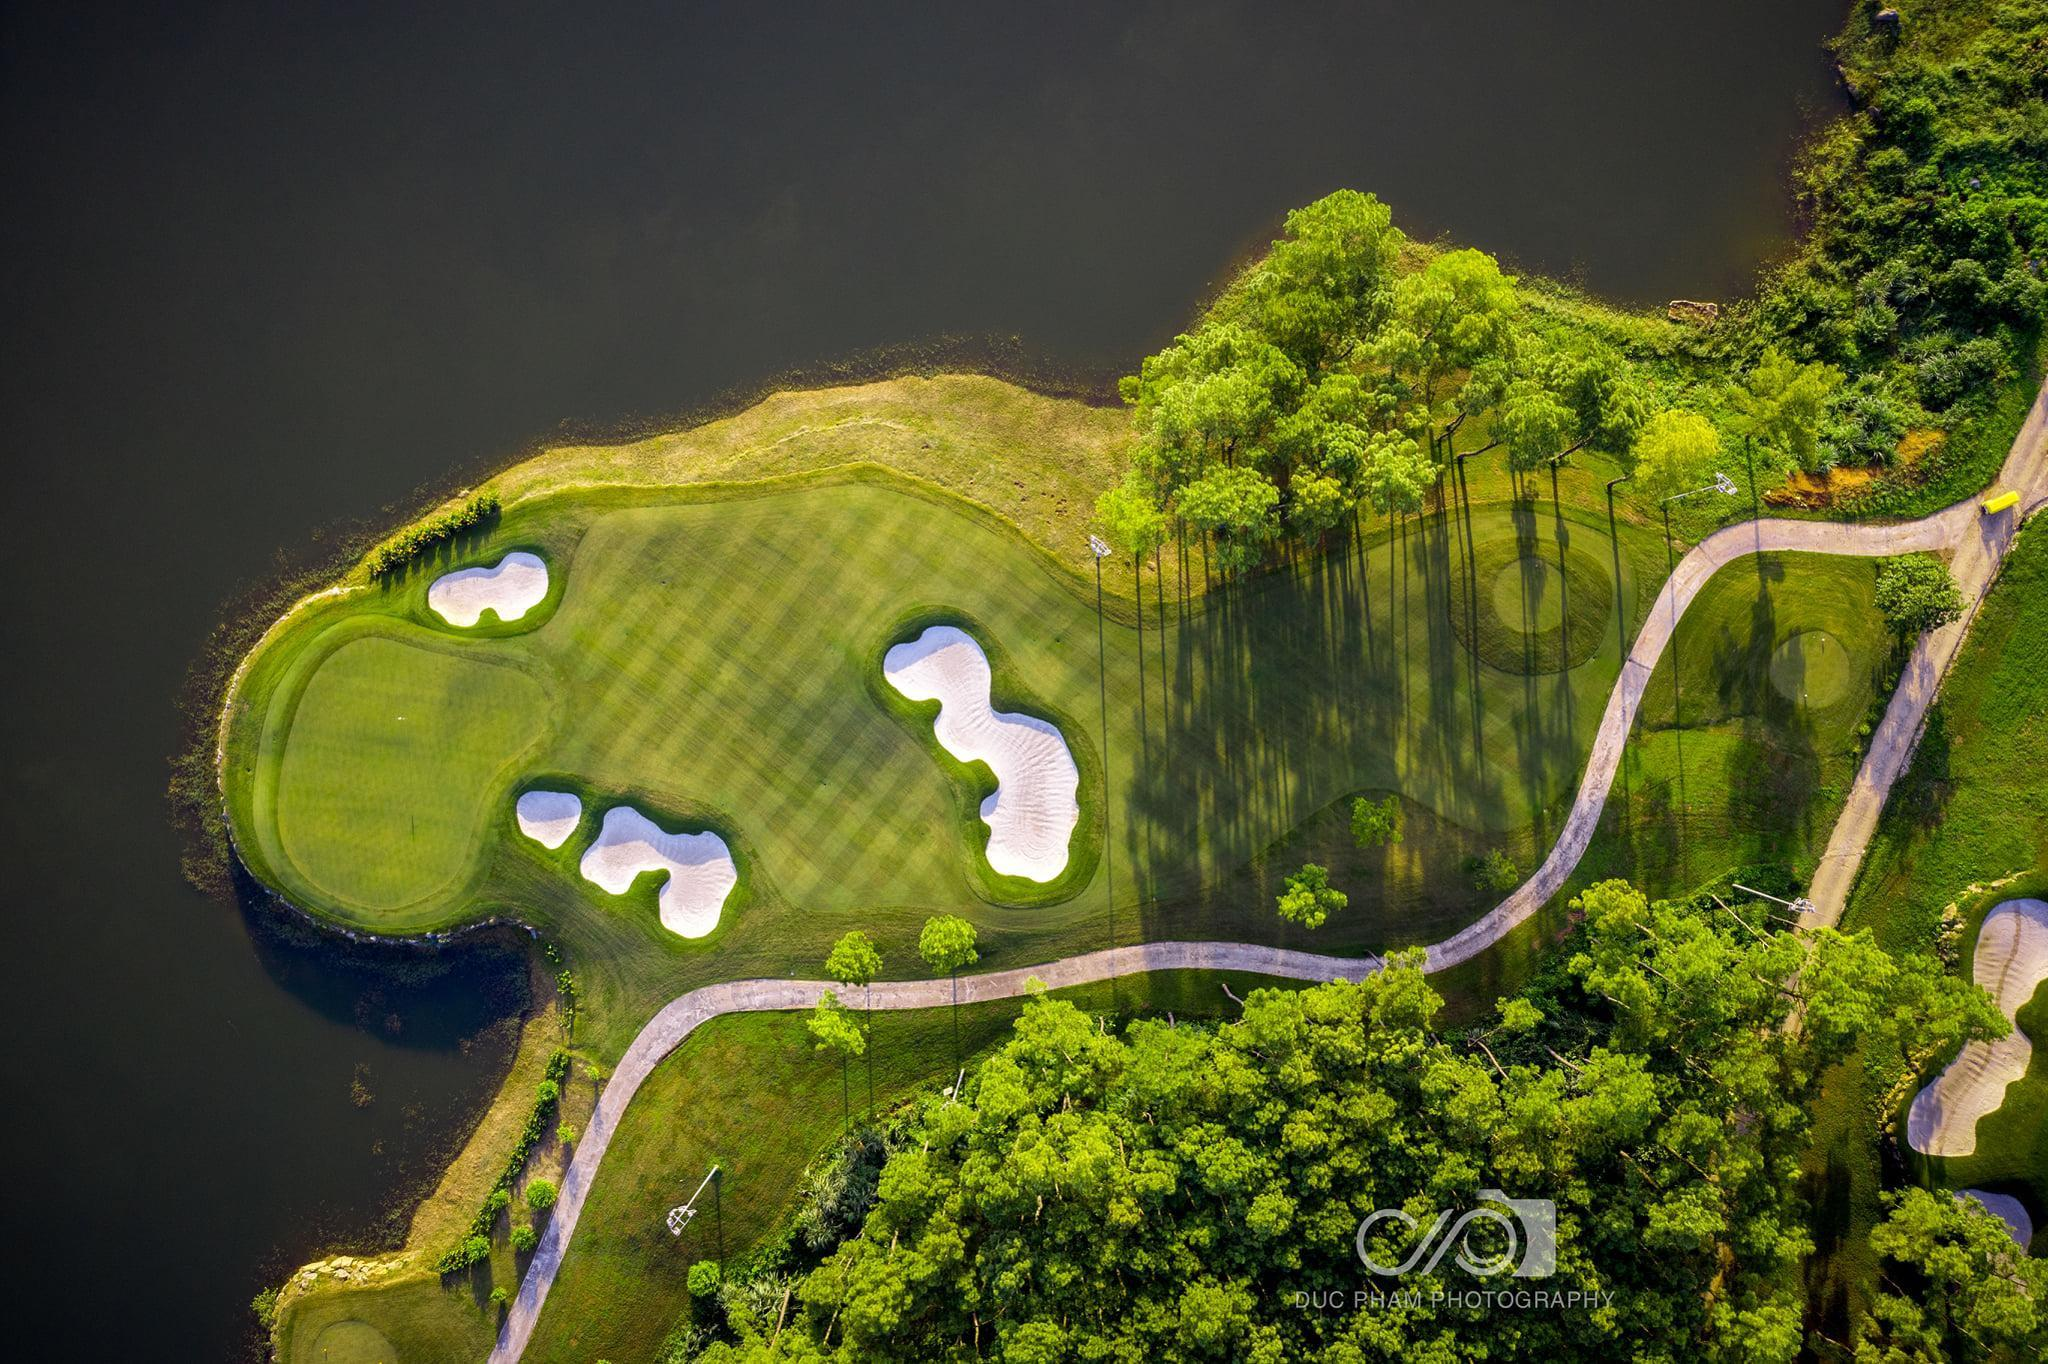 Tee off sân golf Tràng An 18 hố - Cuối tuần